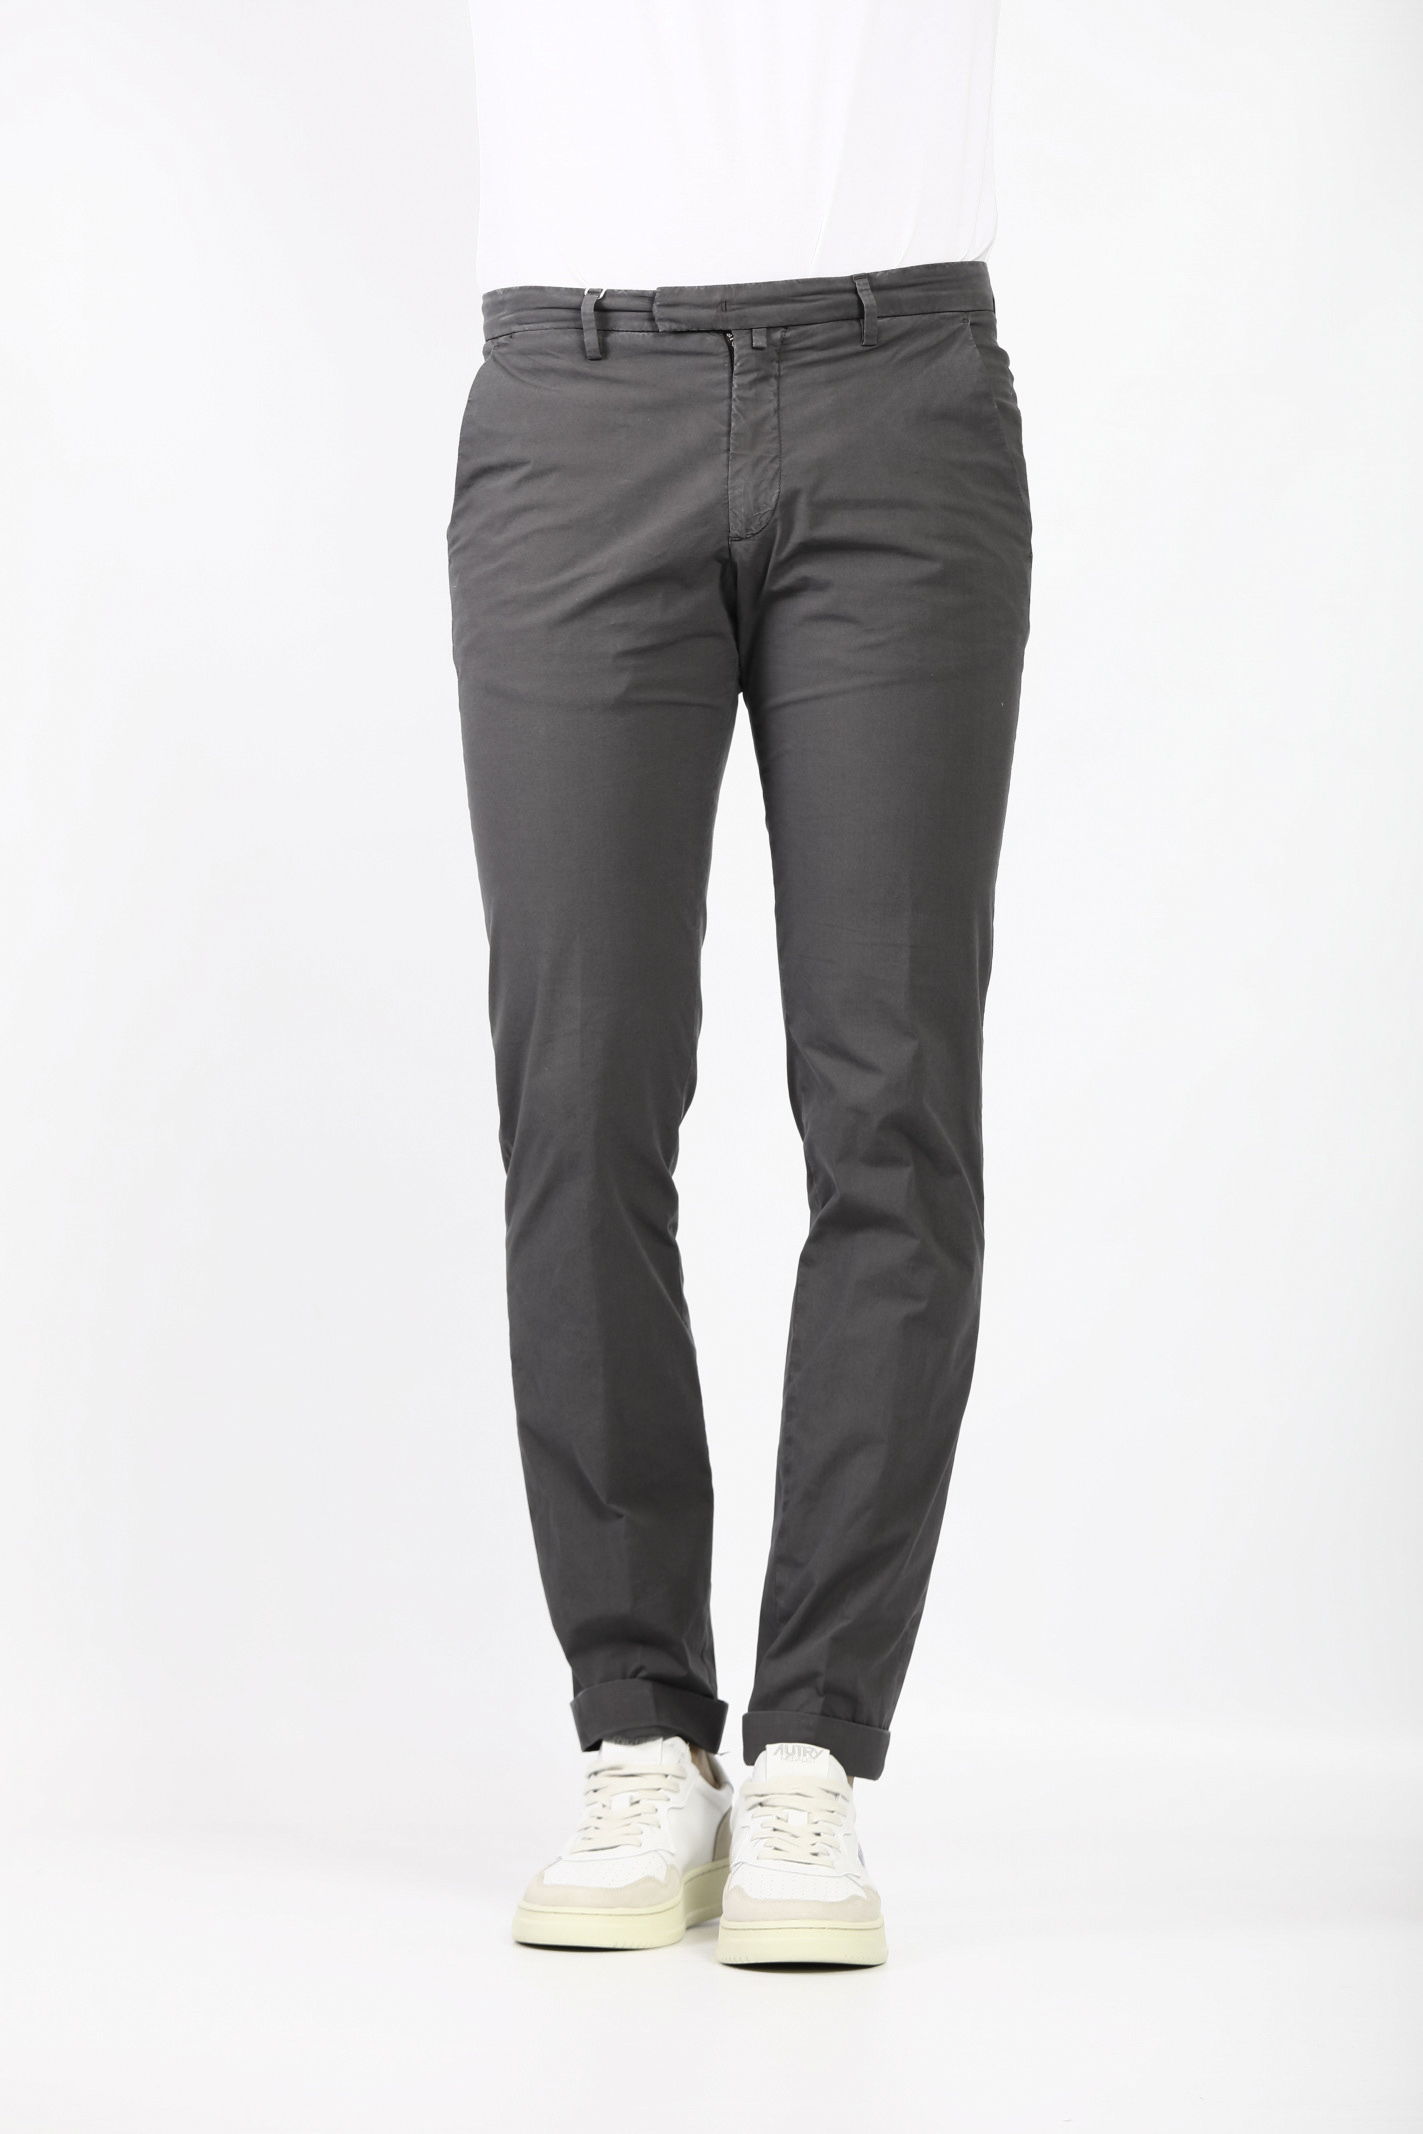 PANTS BRIGLIA   Pants   BG03-32151000590